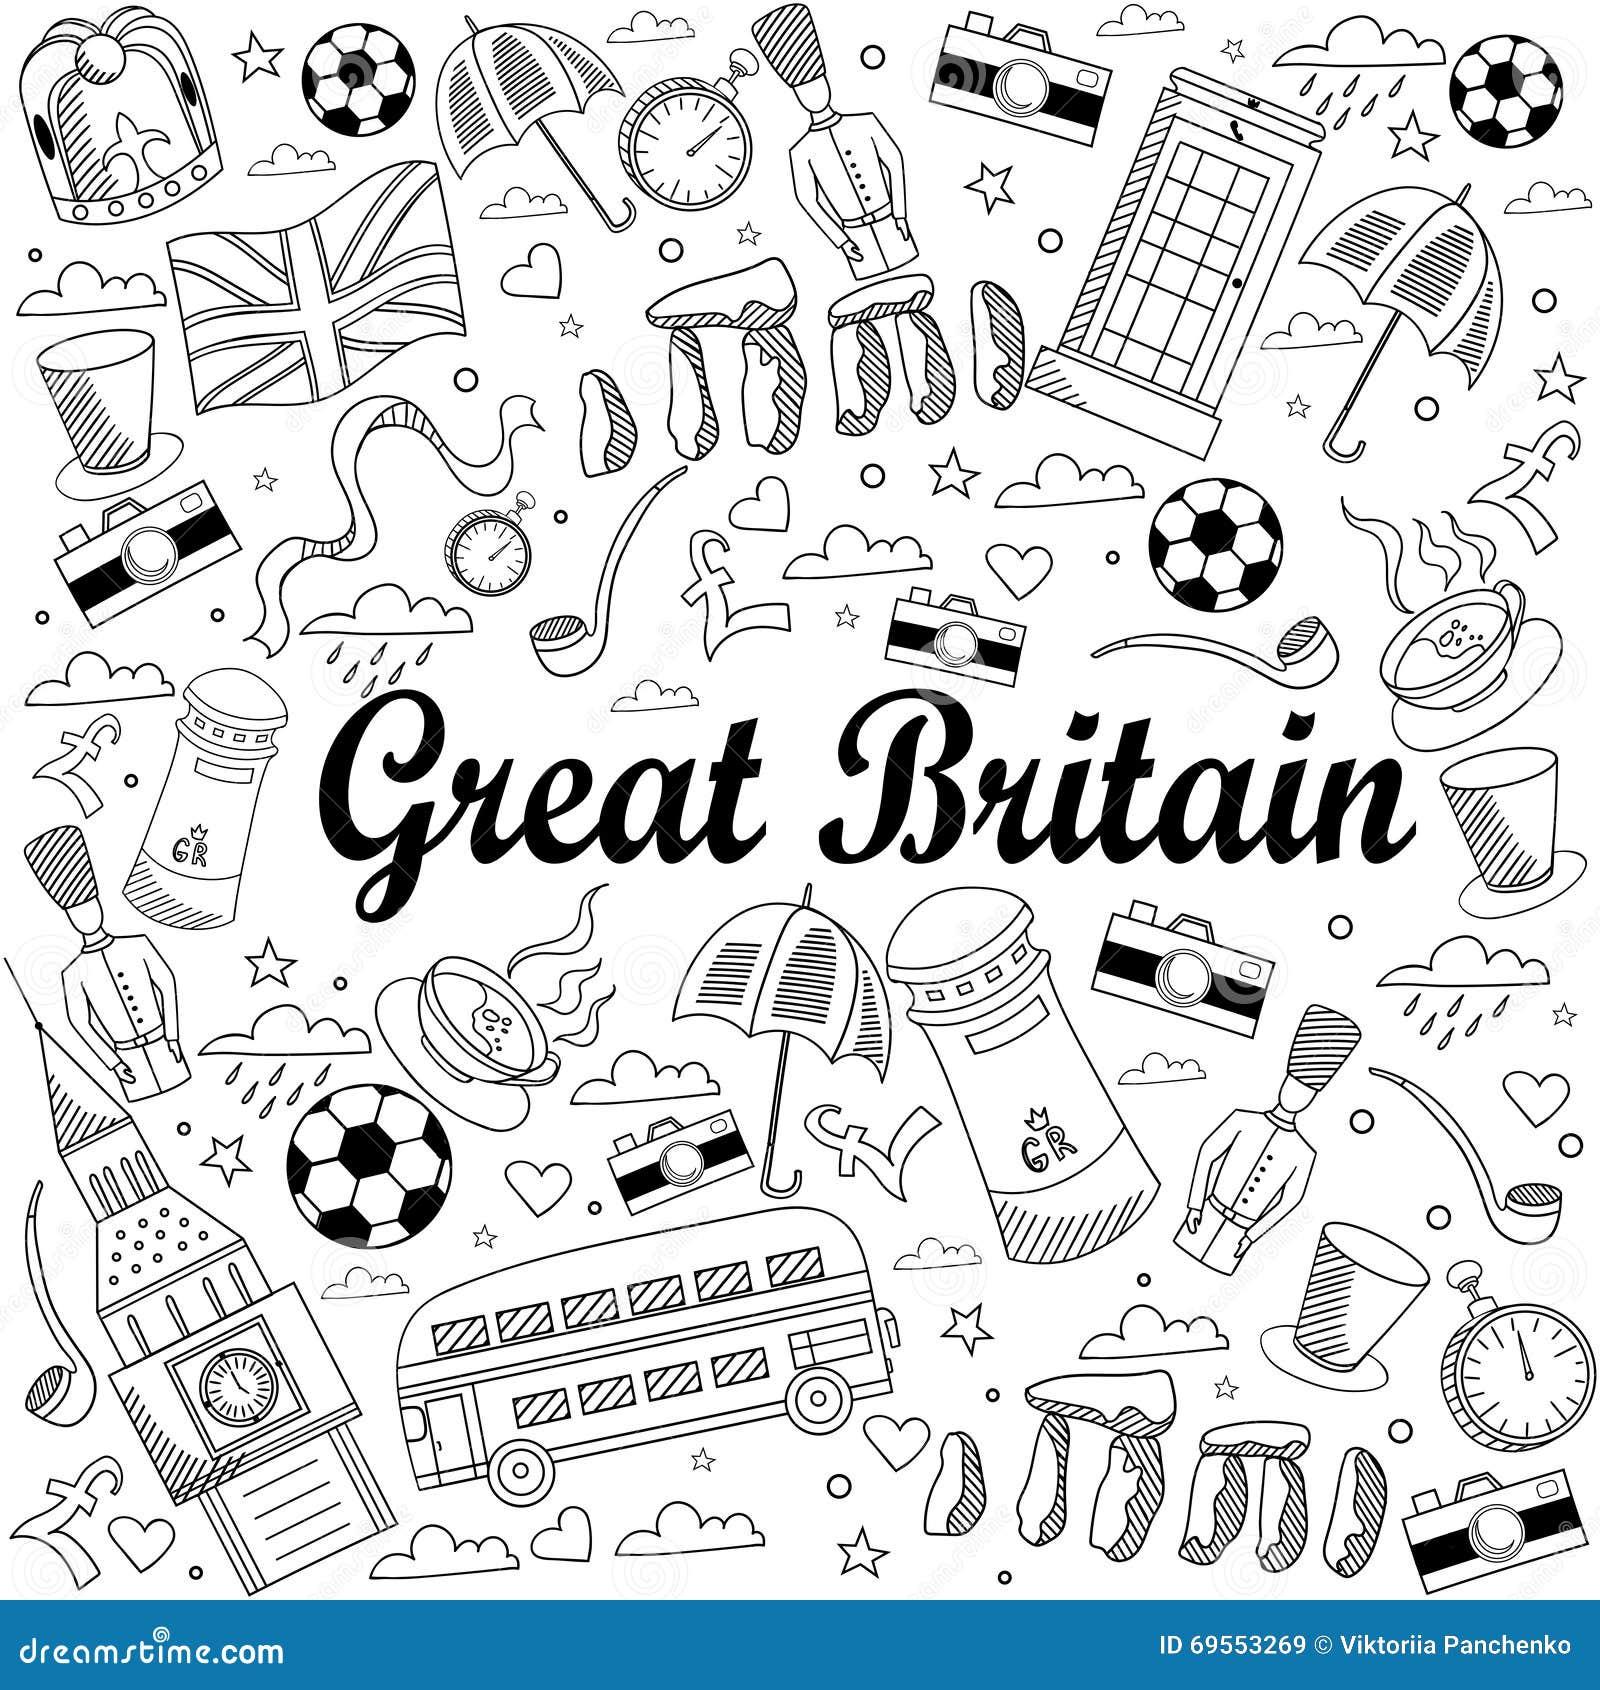 Gran Bretagna Cartina Da Colorare.Simboli Gran Bretagna Da Colorare